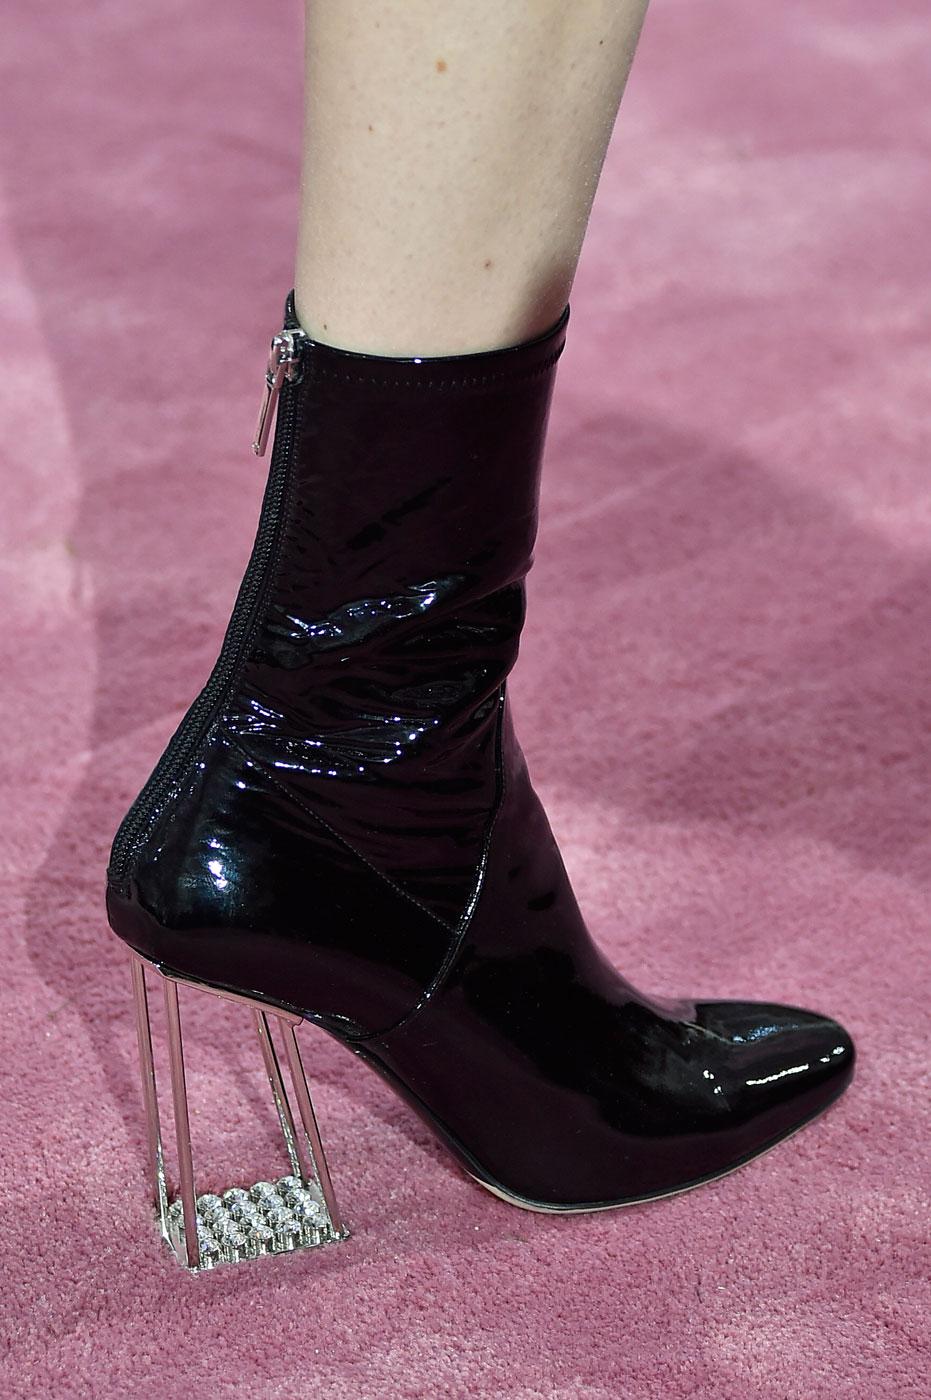 Christian-Dior-fashion-runway-show-close-ups-haute-couture-paris-spring-summer-2015-the-impression-038